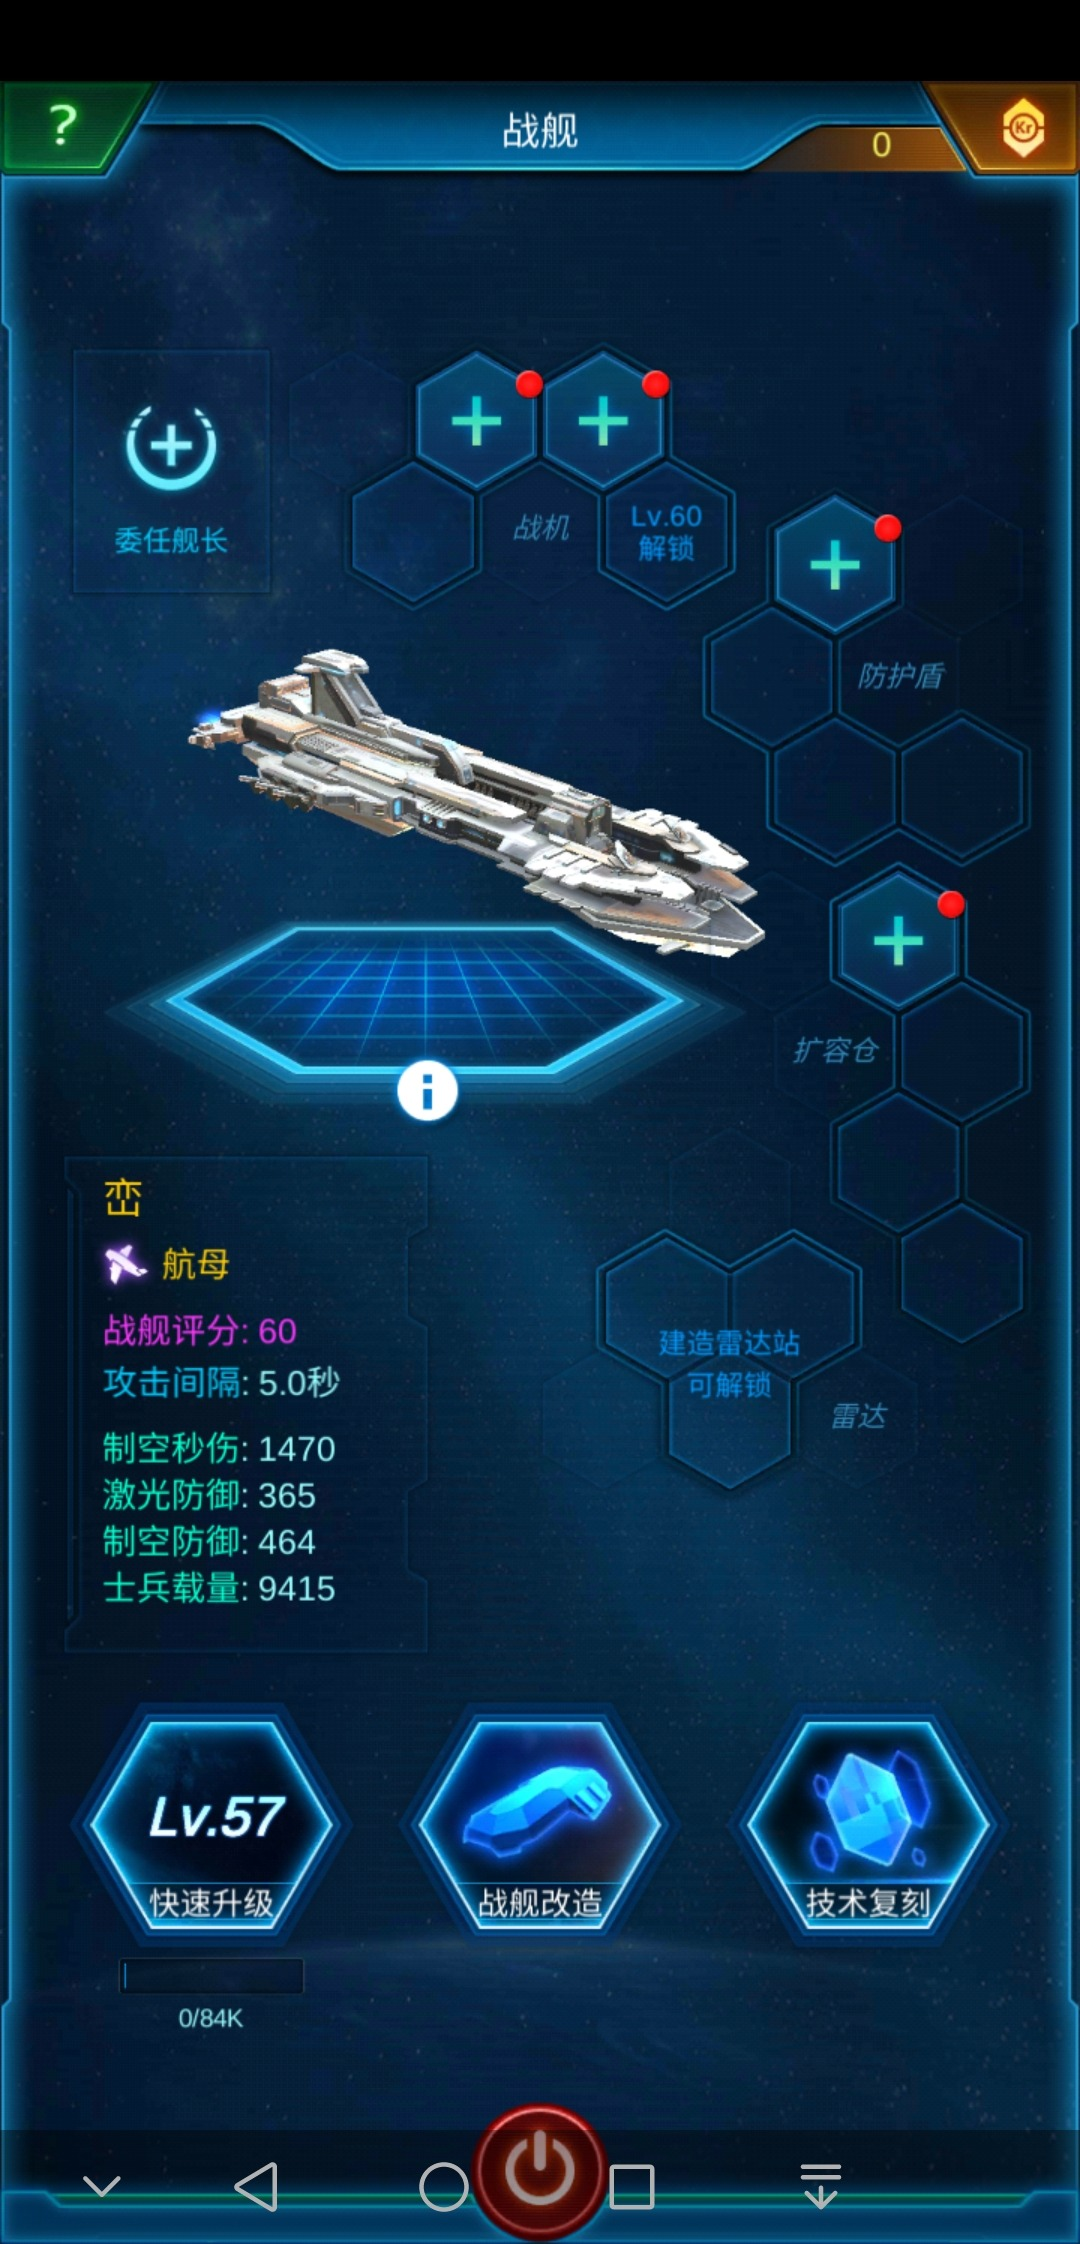 Screenshot_20200309_135704_com.jedigames.p16s.huawei.jpg